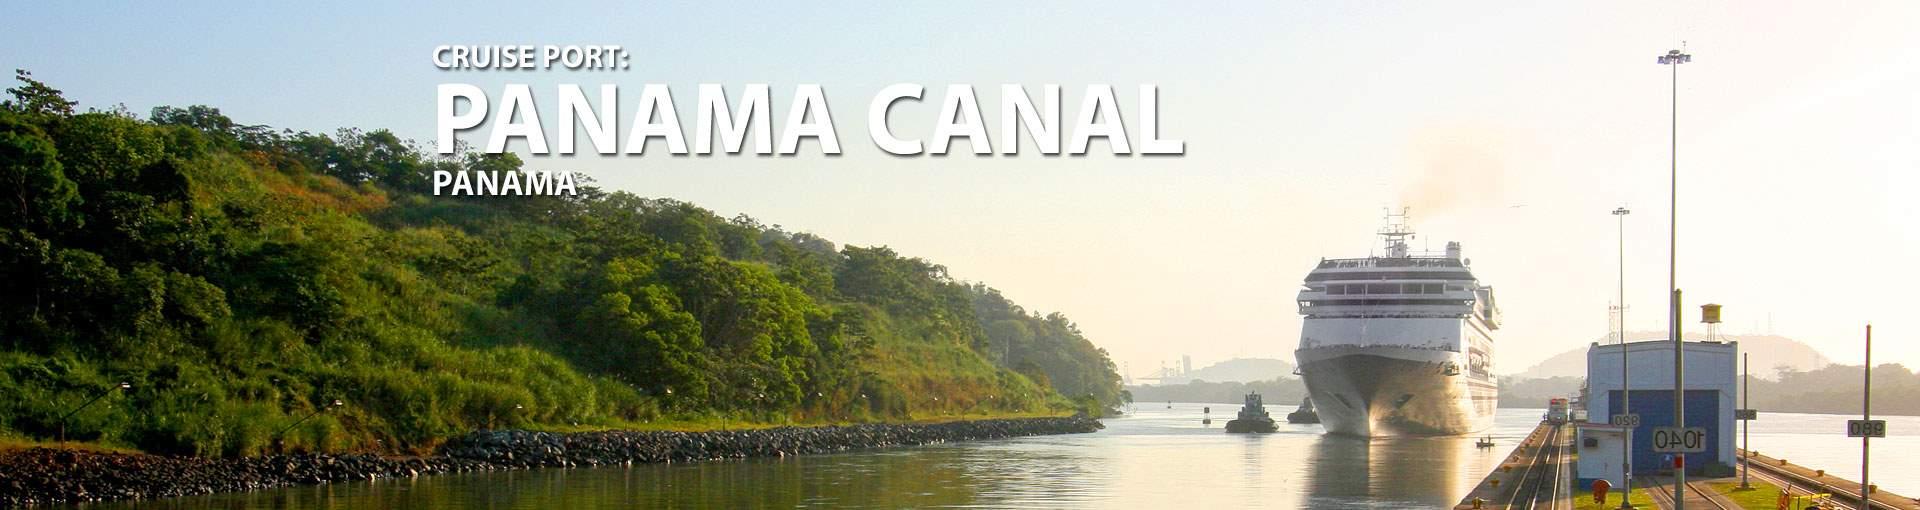 Cruises to Panama Canal, Panama